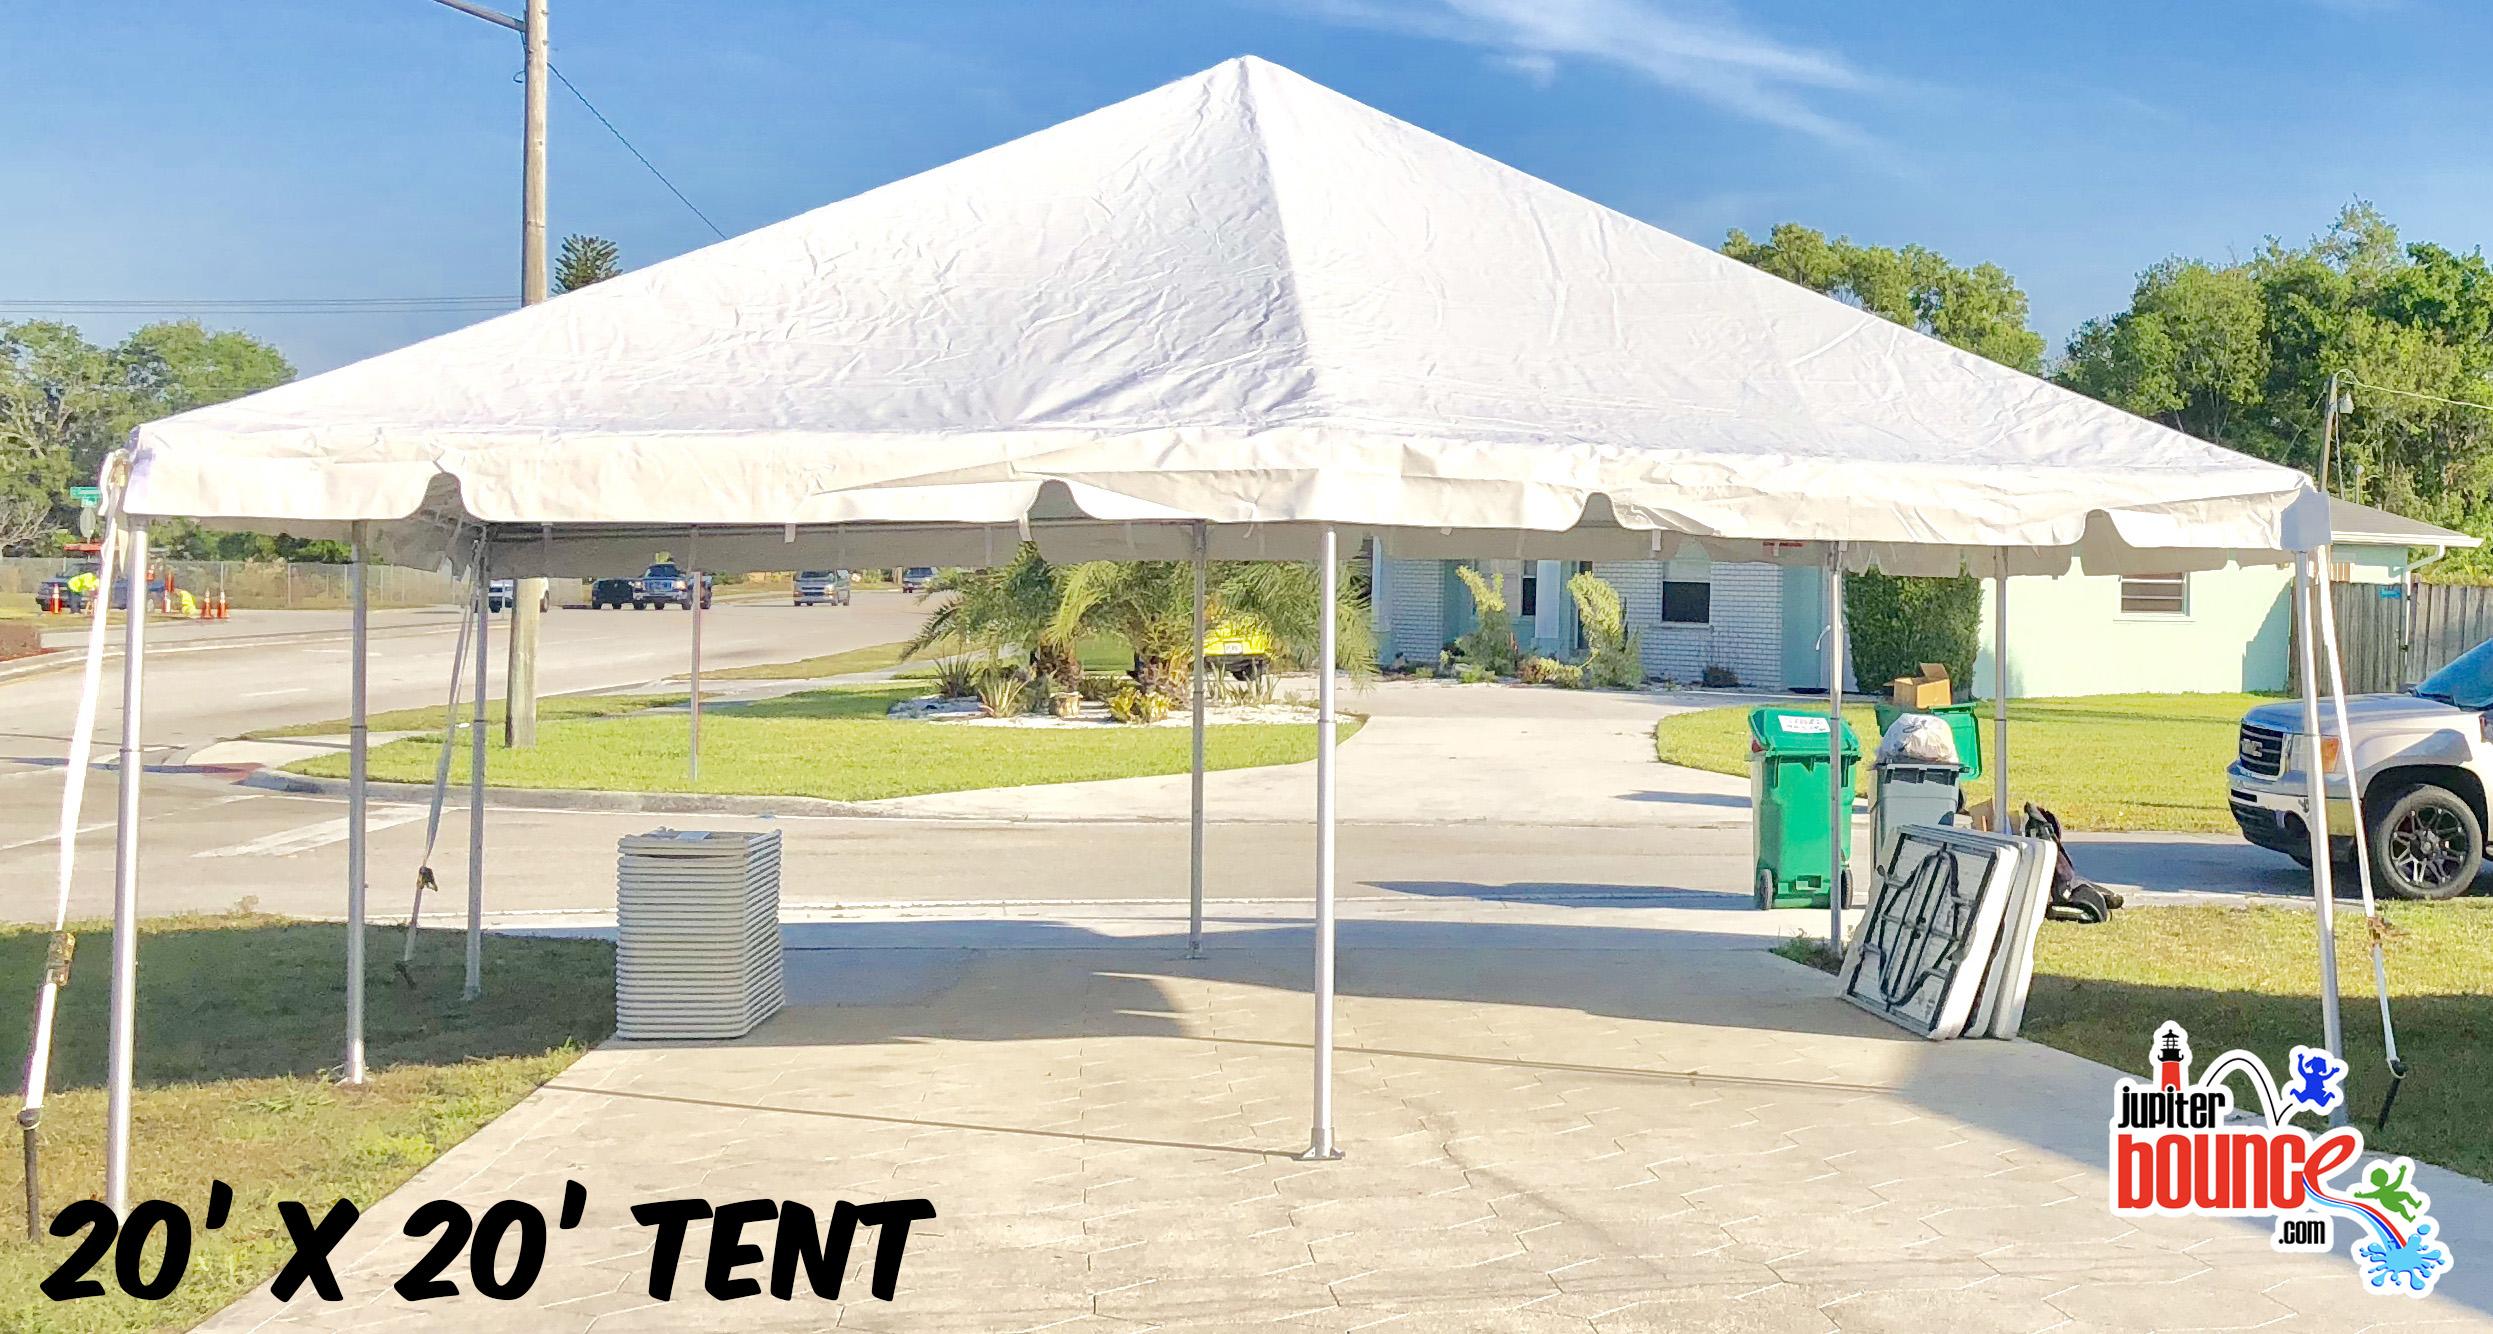 20x20 tent.jpg